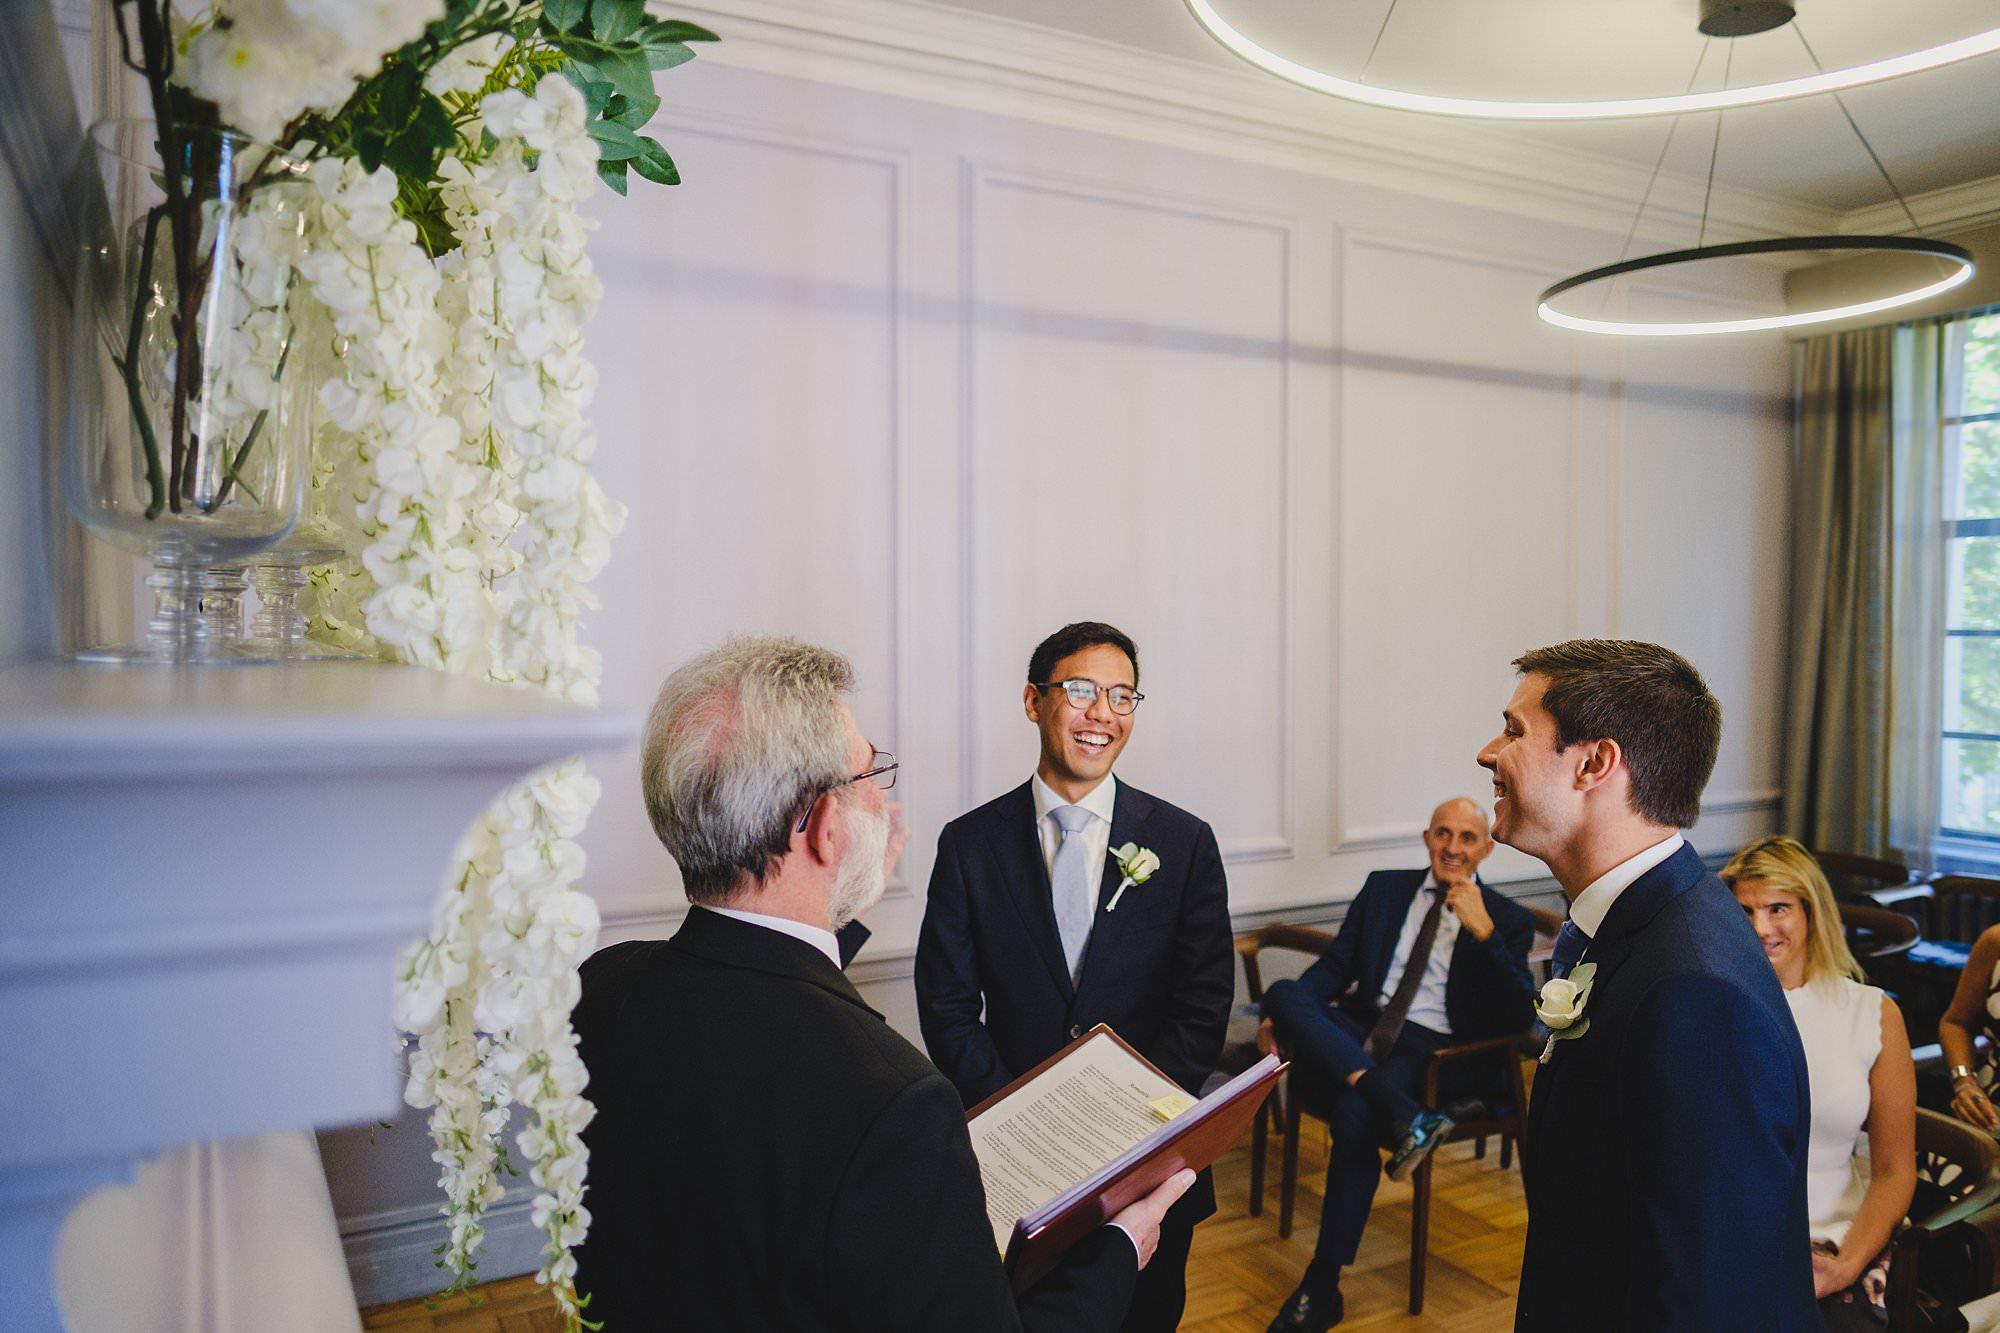 old marylebone town hall wedding photographer wedding jh 013 - Hugo + Josh   Marylebone